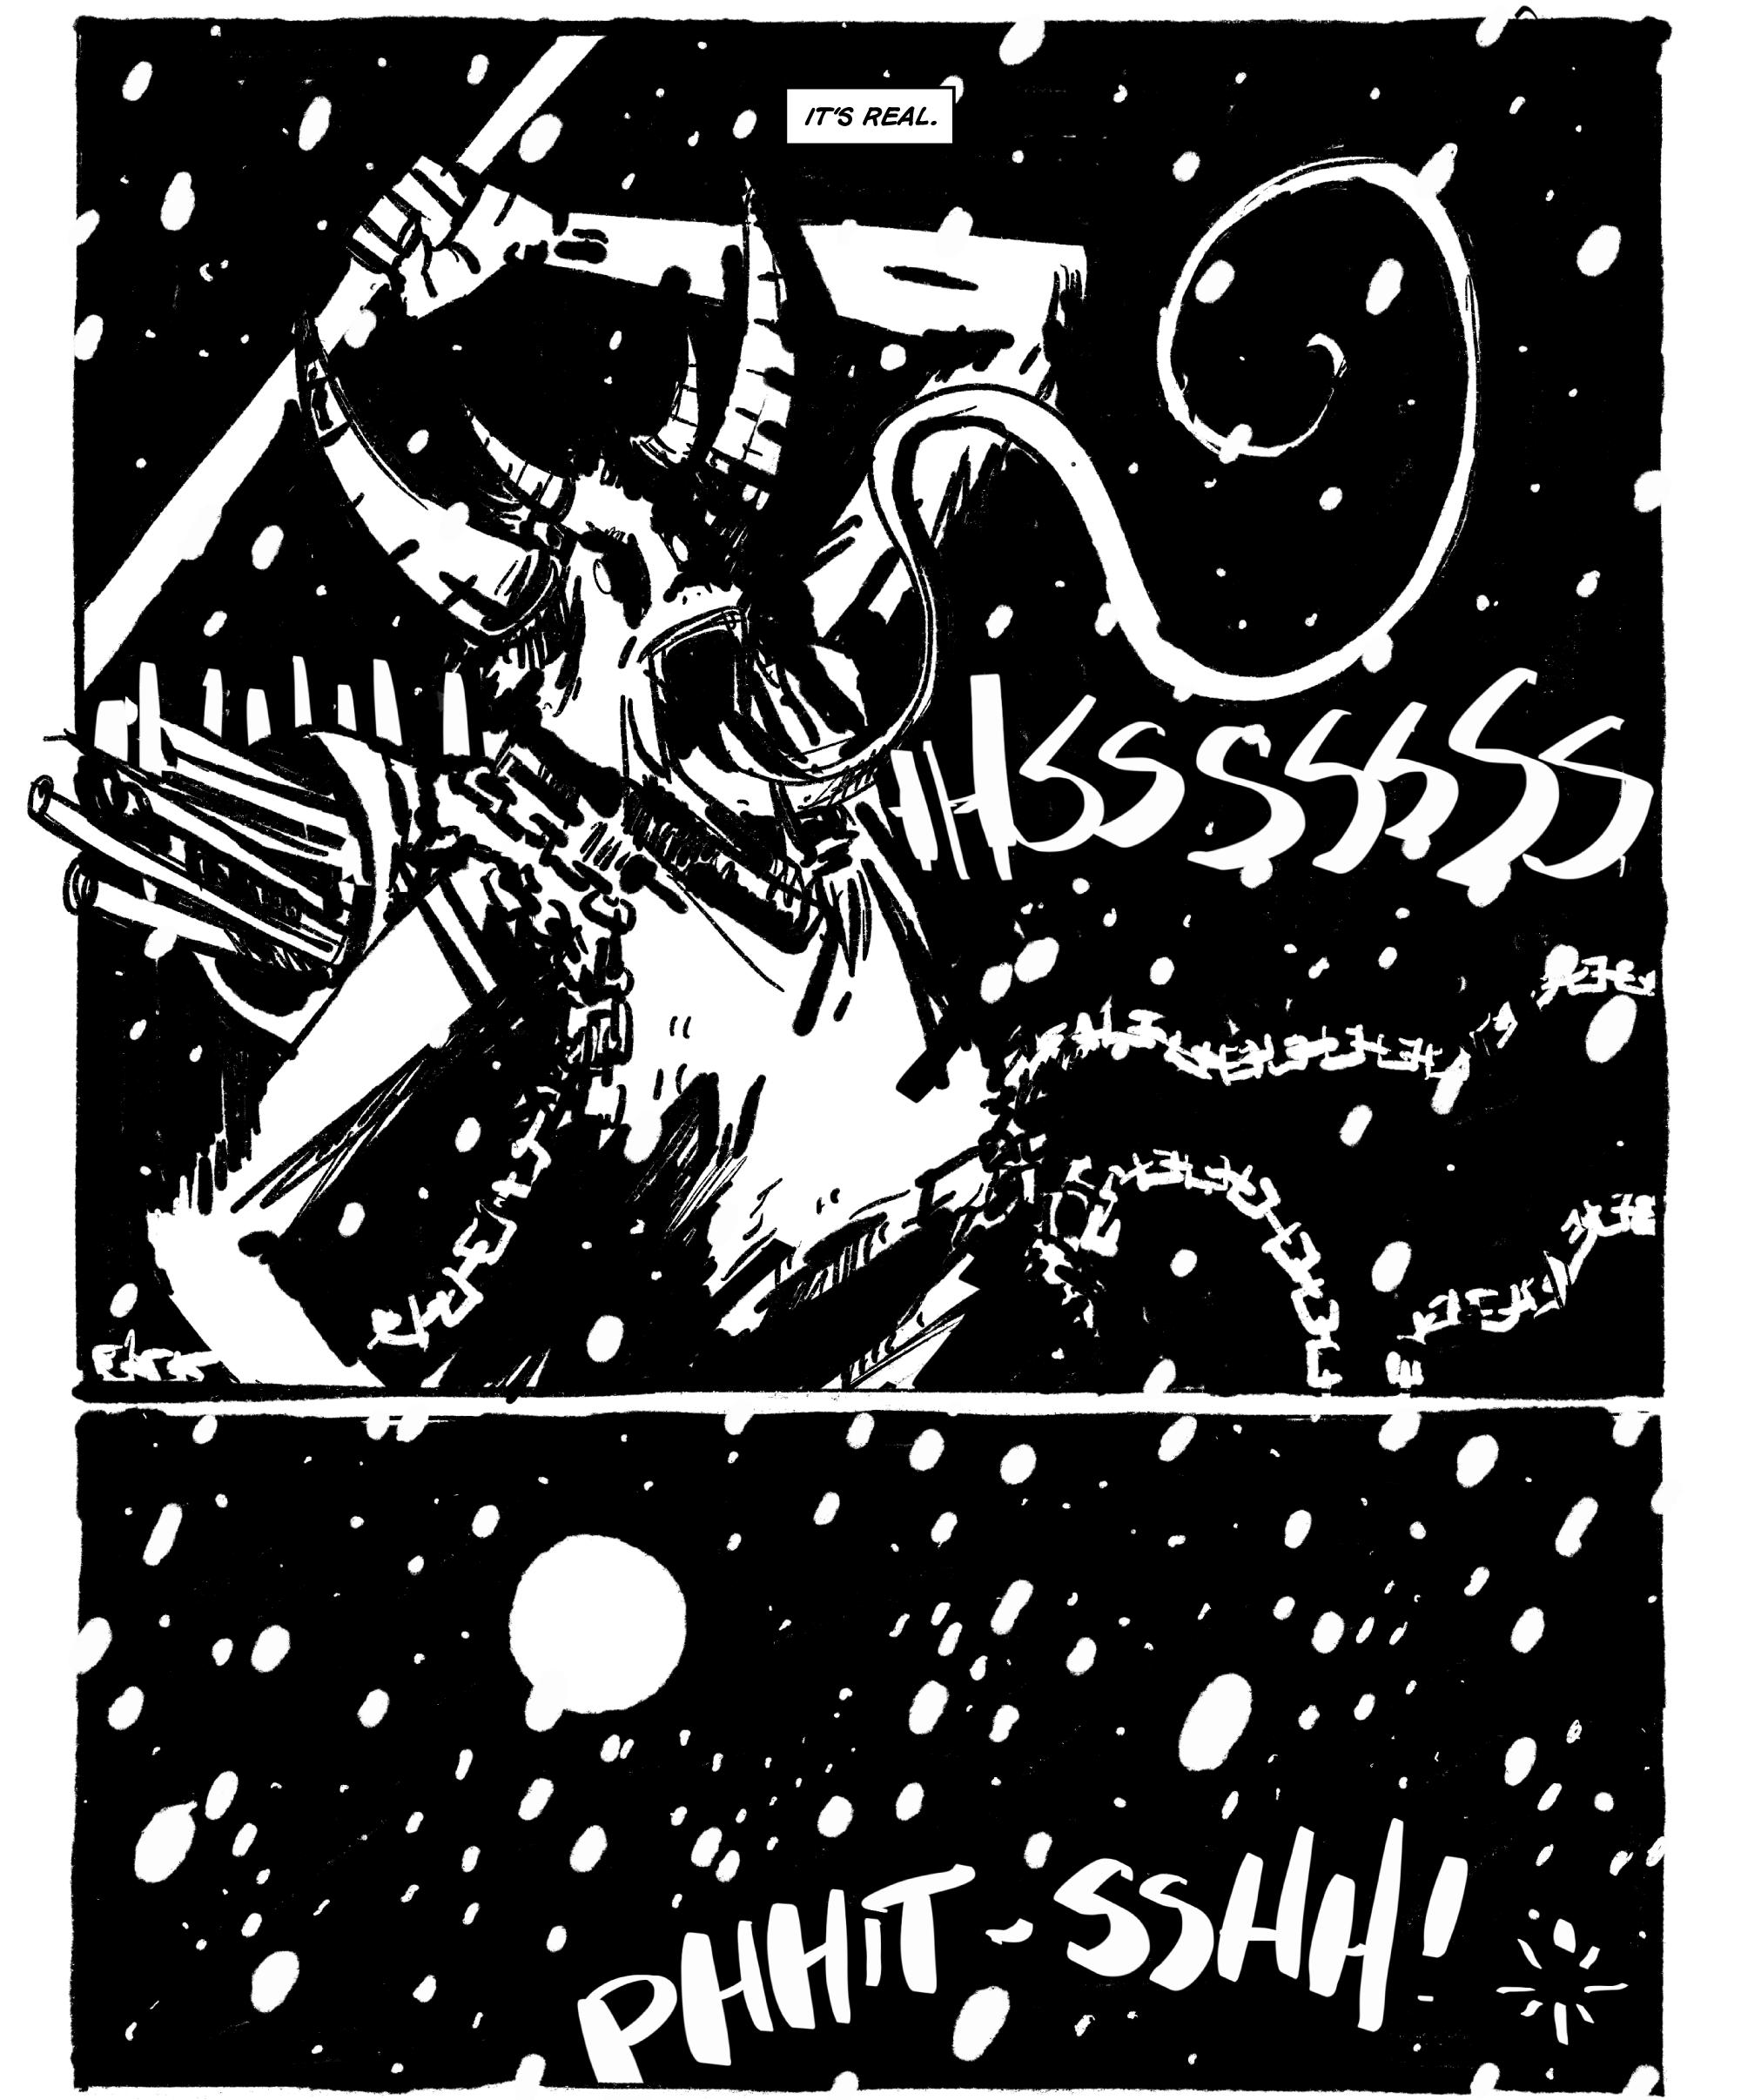 Krampus page 9